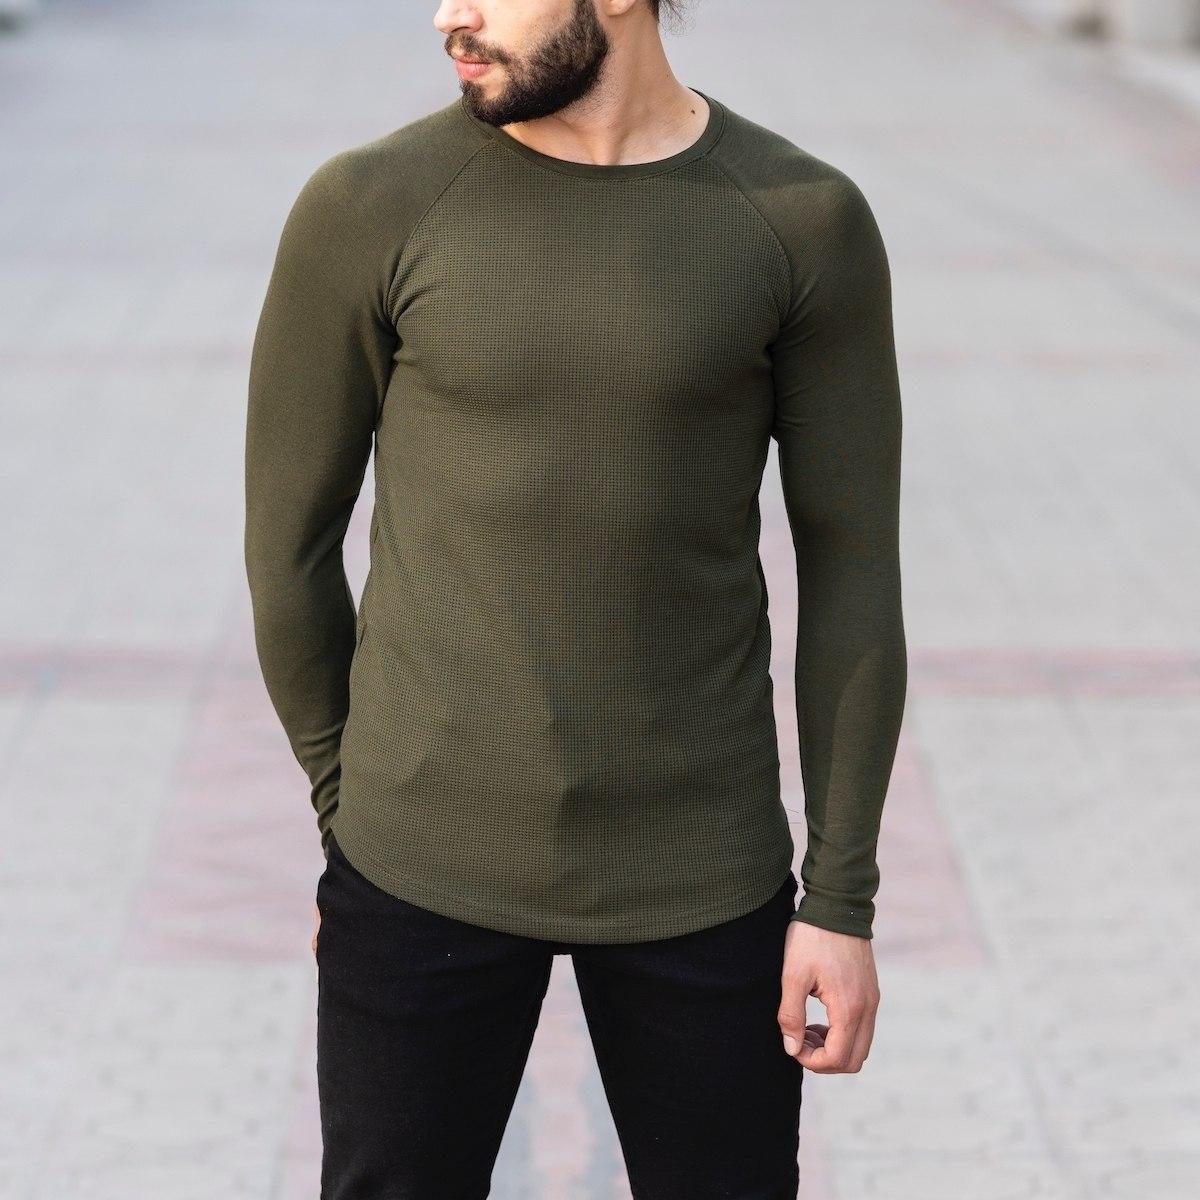 Dotwork Sweatshirt In Khahki Mv Premium Brand - 1